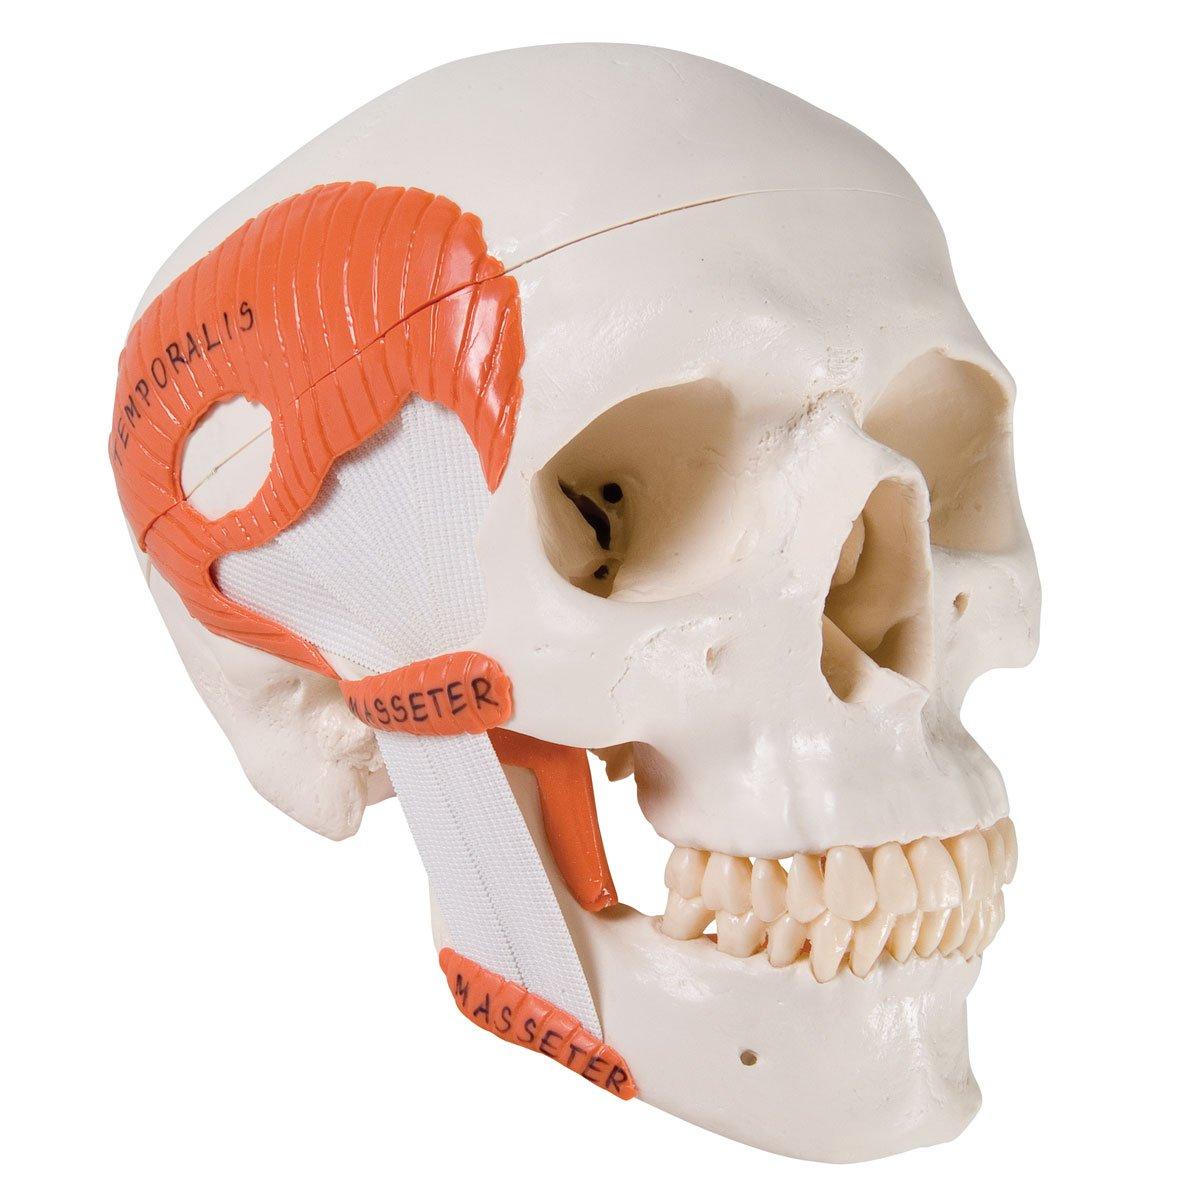 3B Scientific A24 Plastic 2 Part TMJ Human Skull Model, Demonstrates Functions of Masticator Muscles